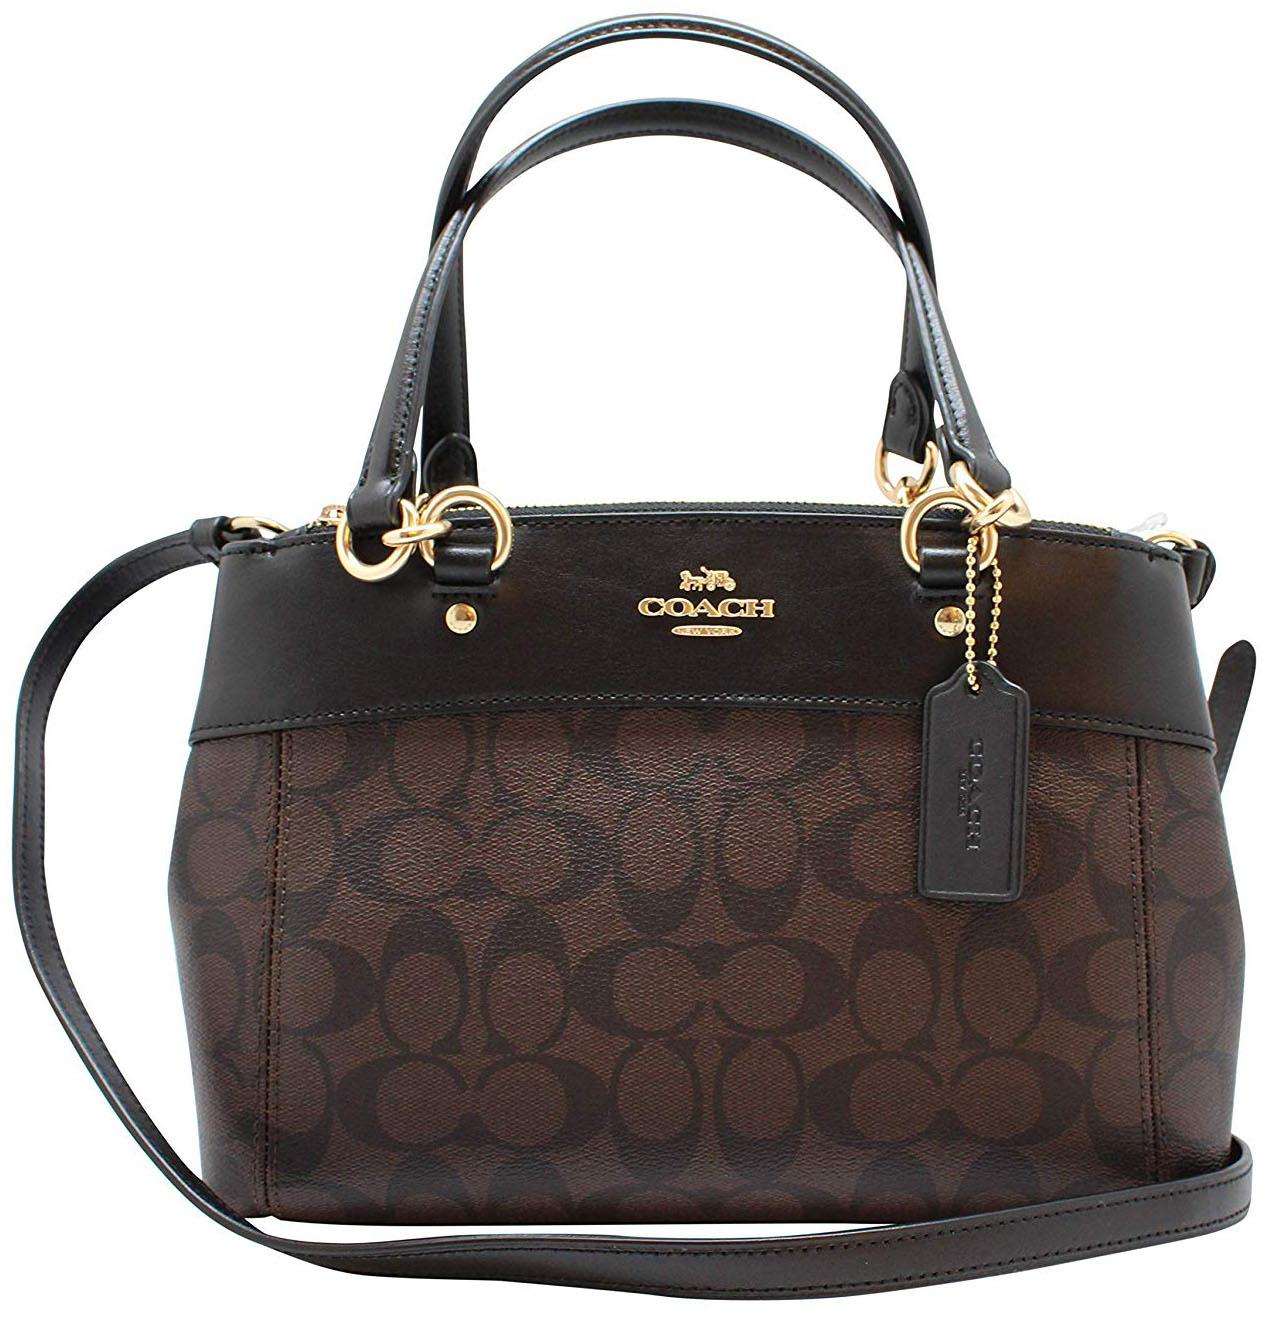 ff6c5ded8f Coach Mini Brooke Carryall Crossbody Bag Handbag Brown   Black   Gold    F26139 + Gift